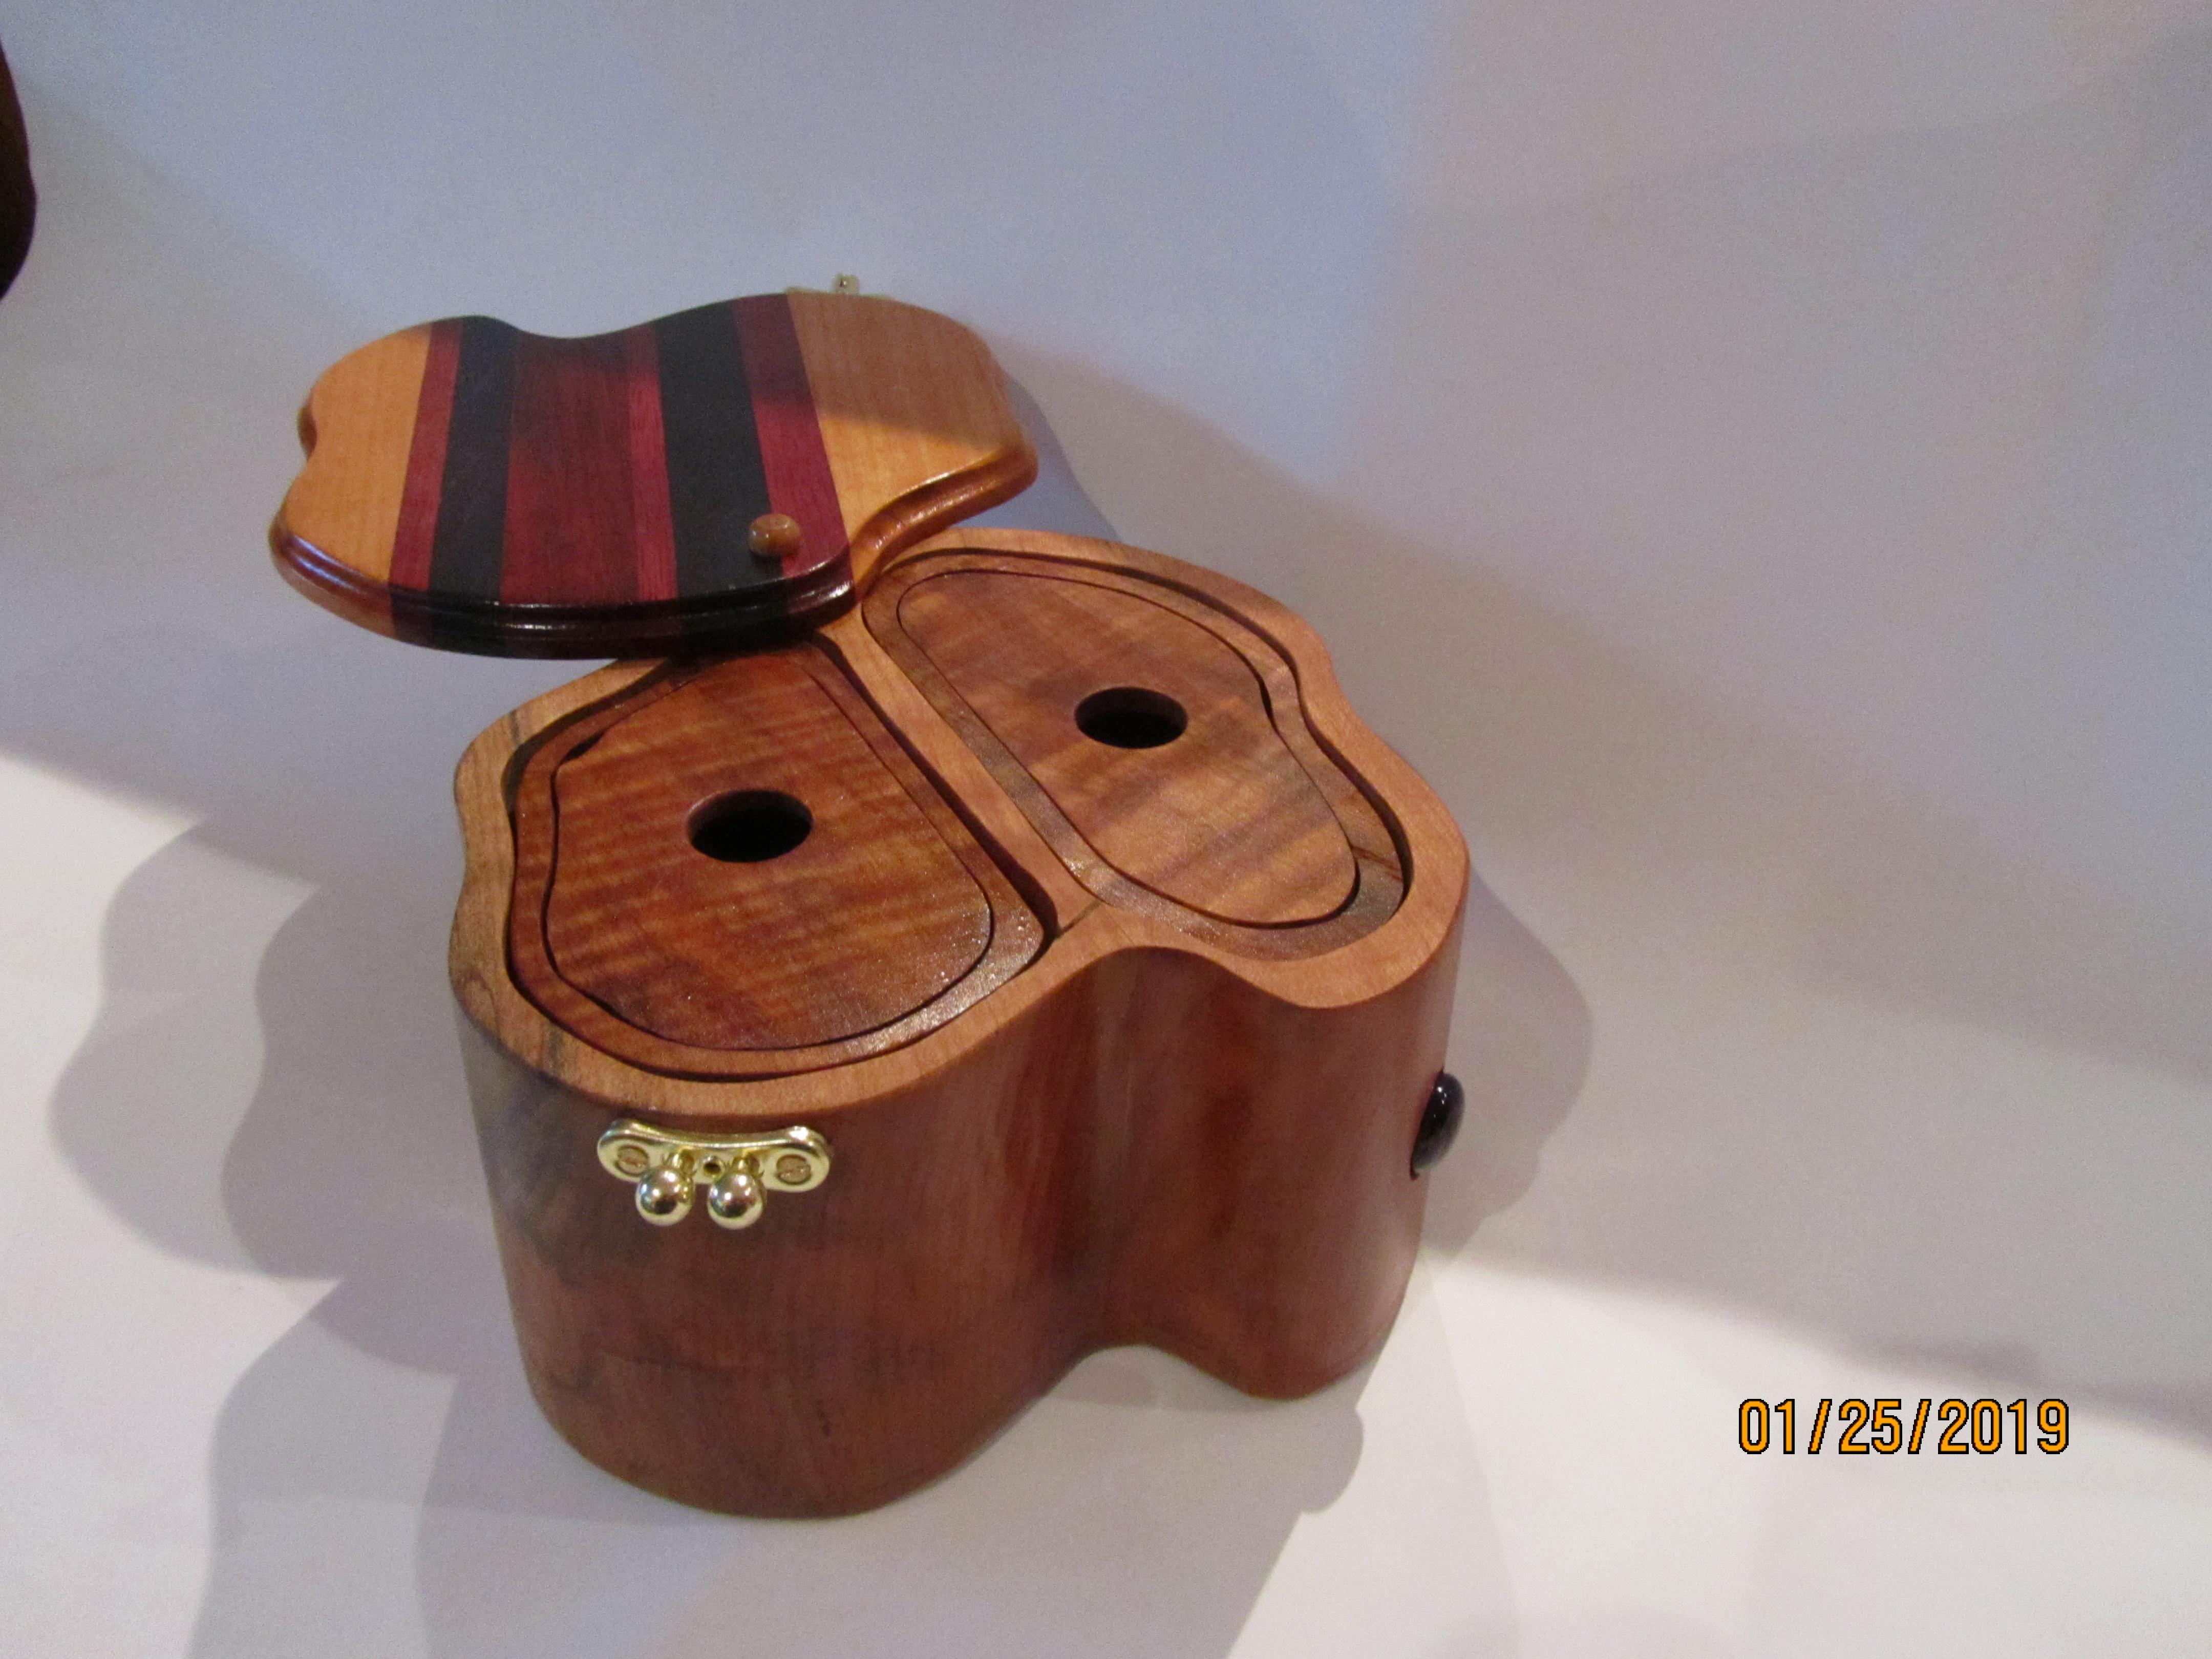 SOLD PB#226 Jewelry Organic Case